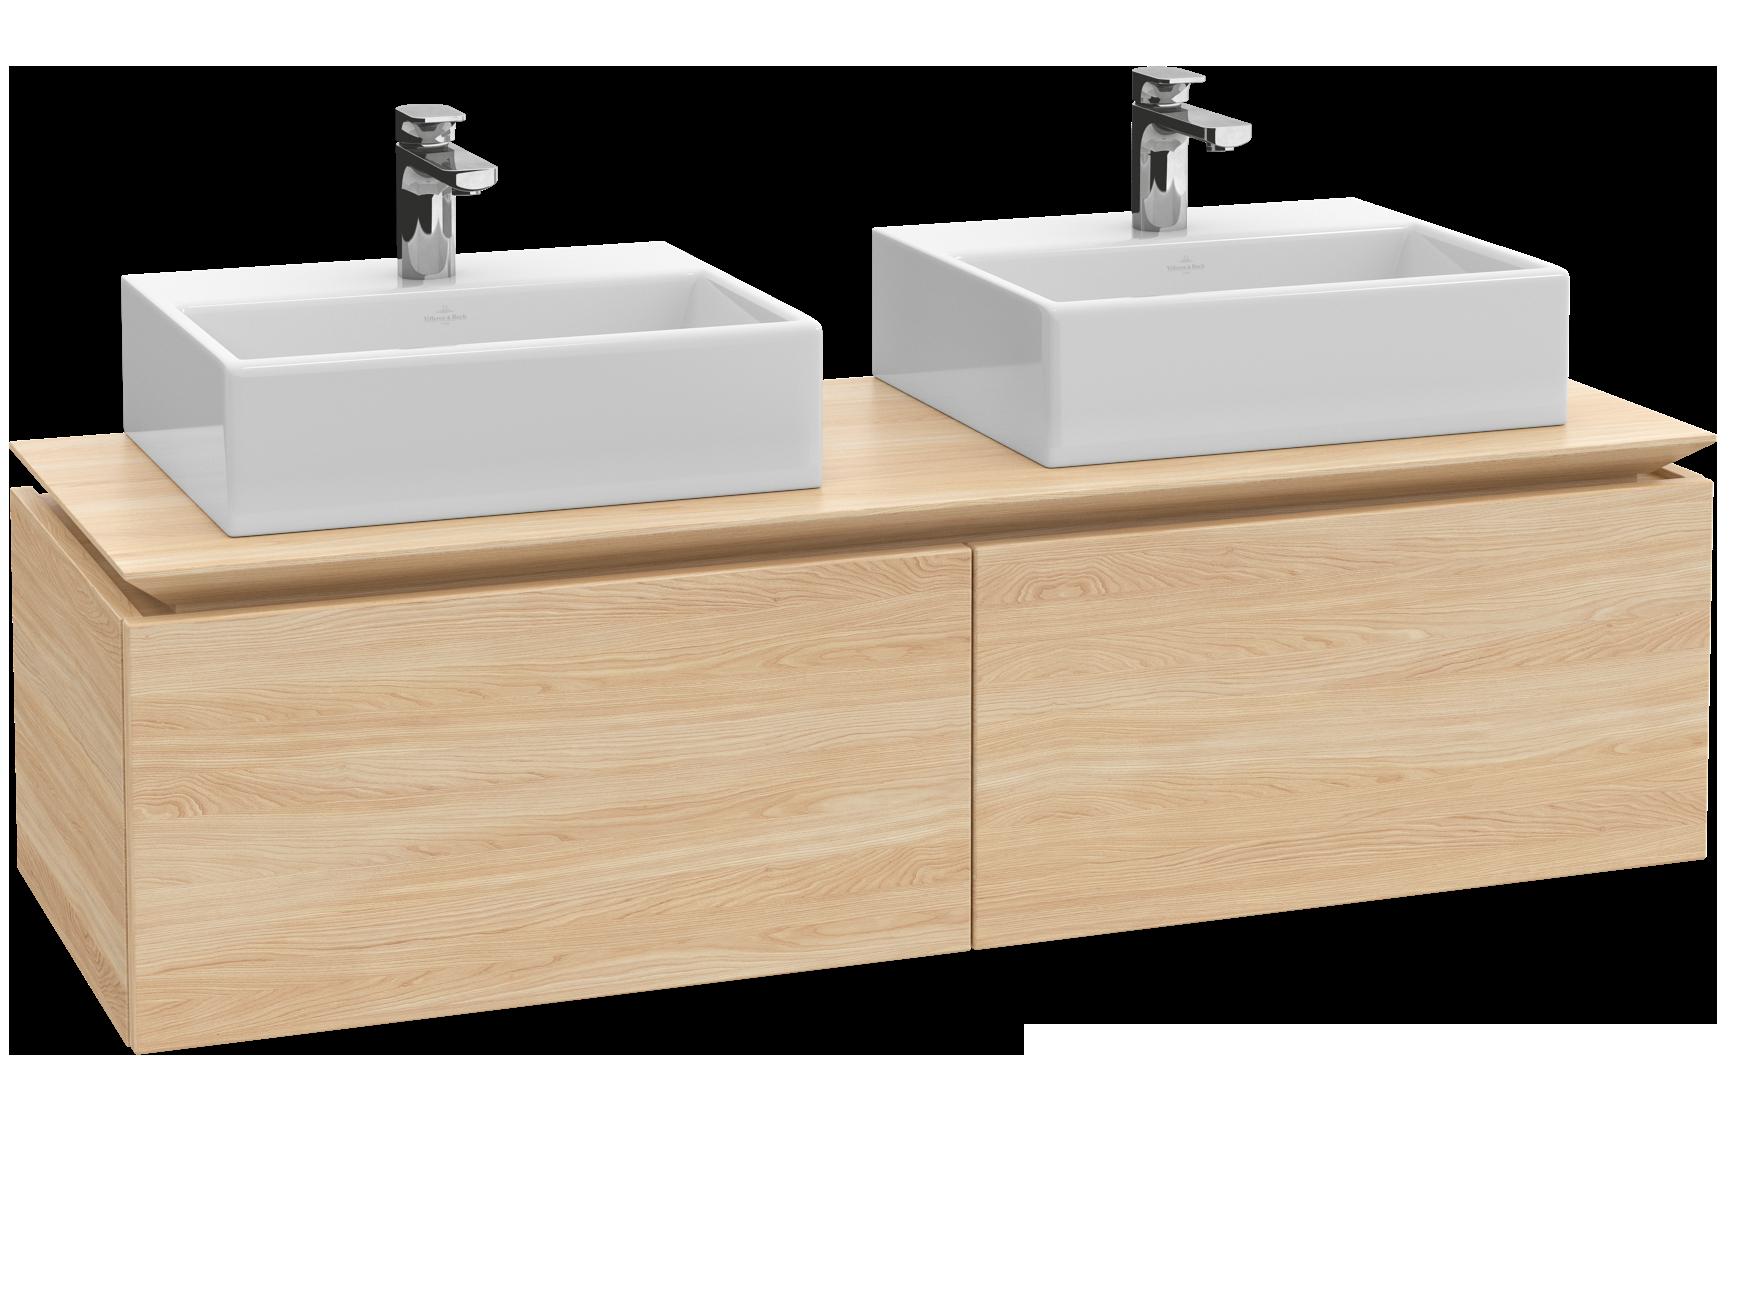 legato waschtischunterschrank b143l0 villeroy boch. Black Bedroom Furniture Sets. Home Design Ideas